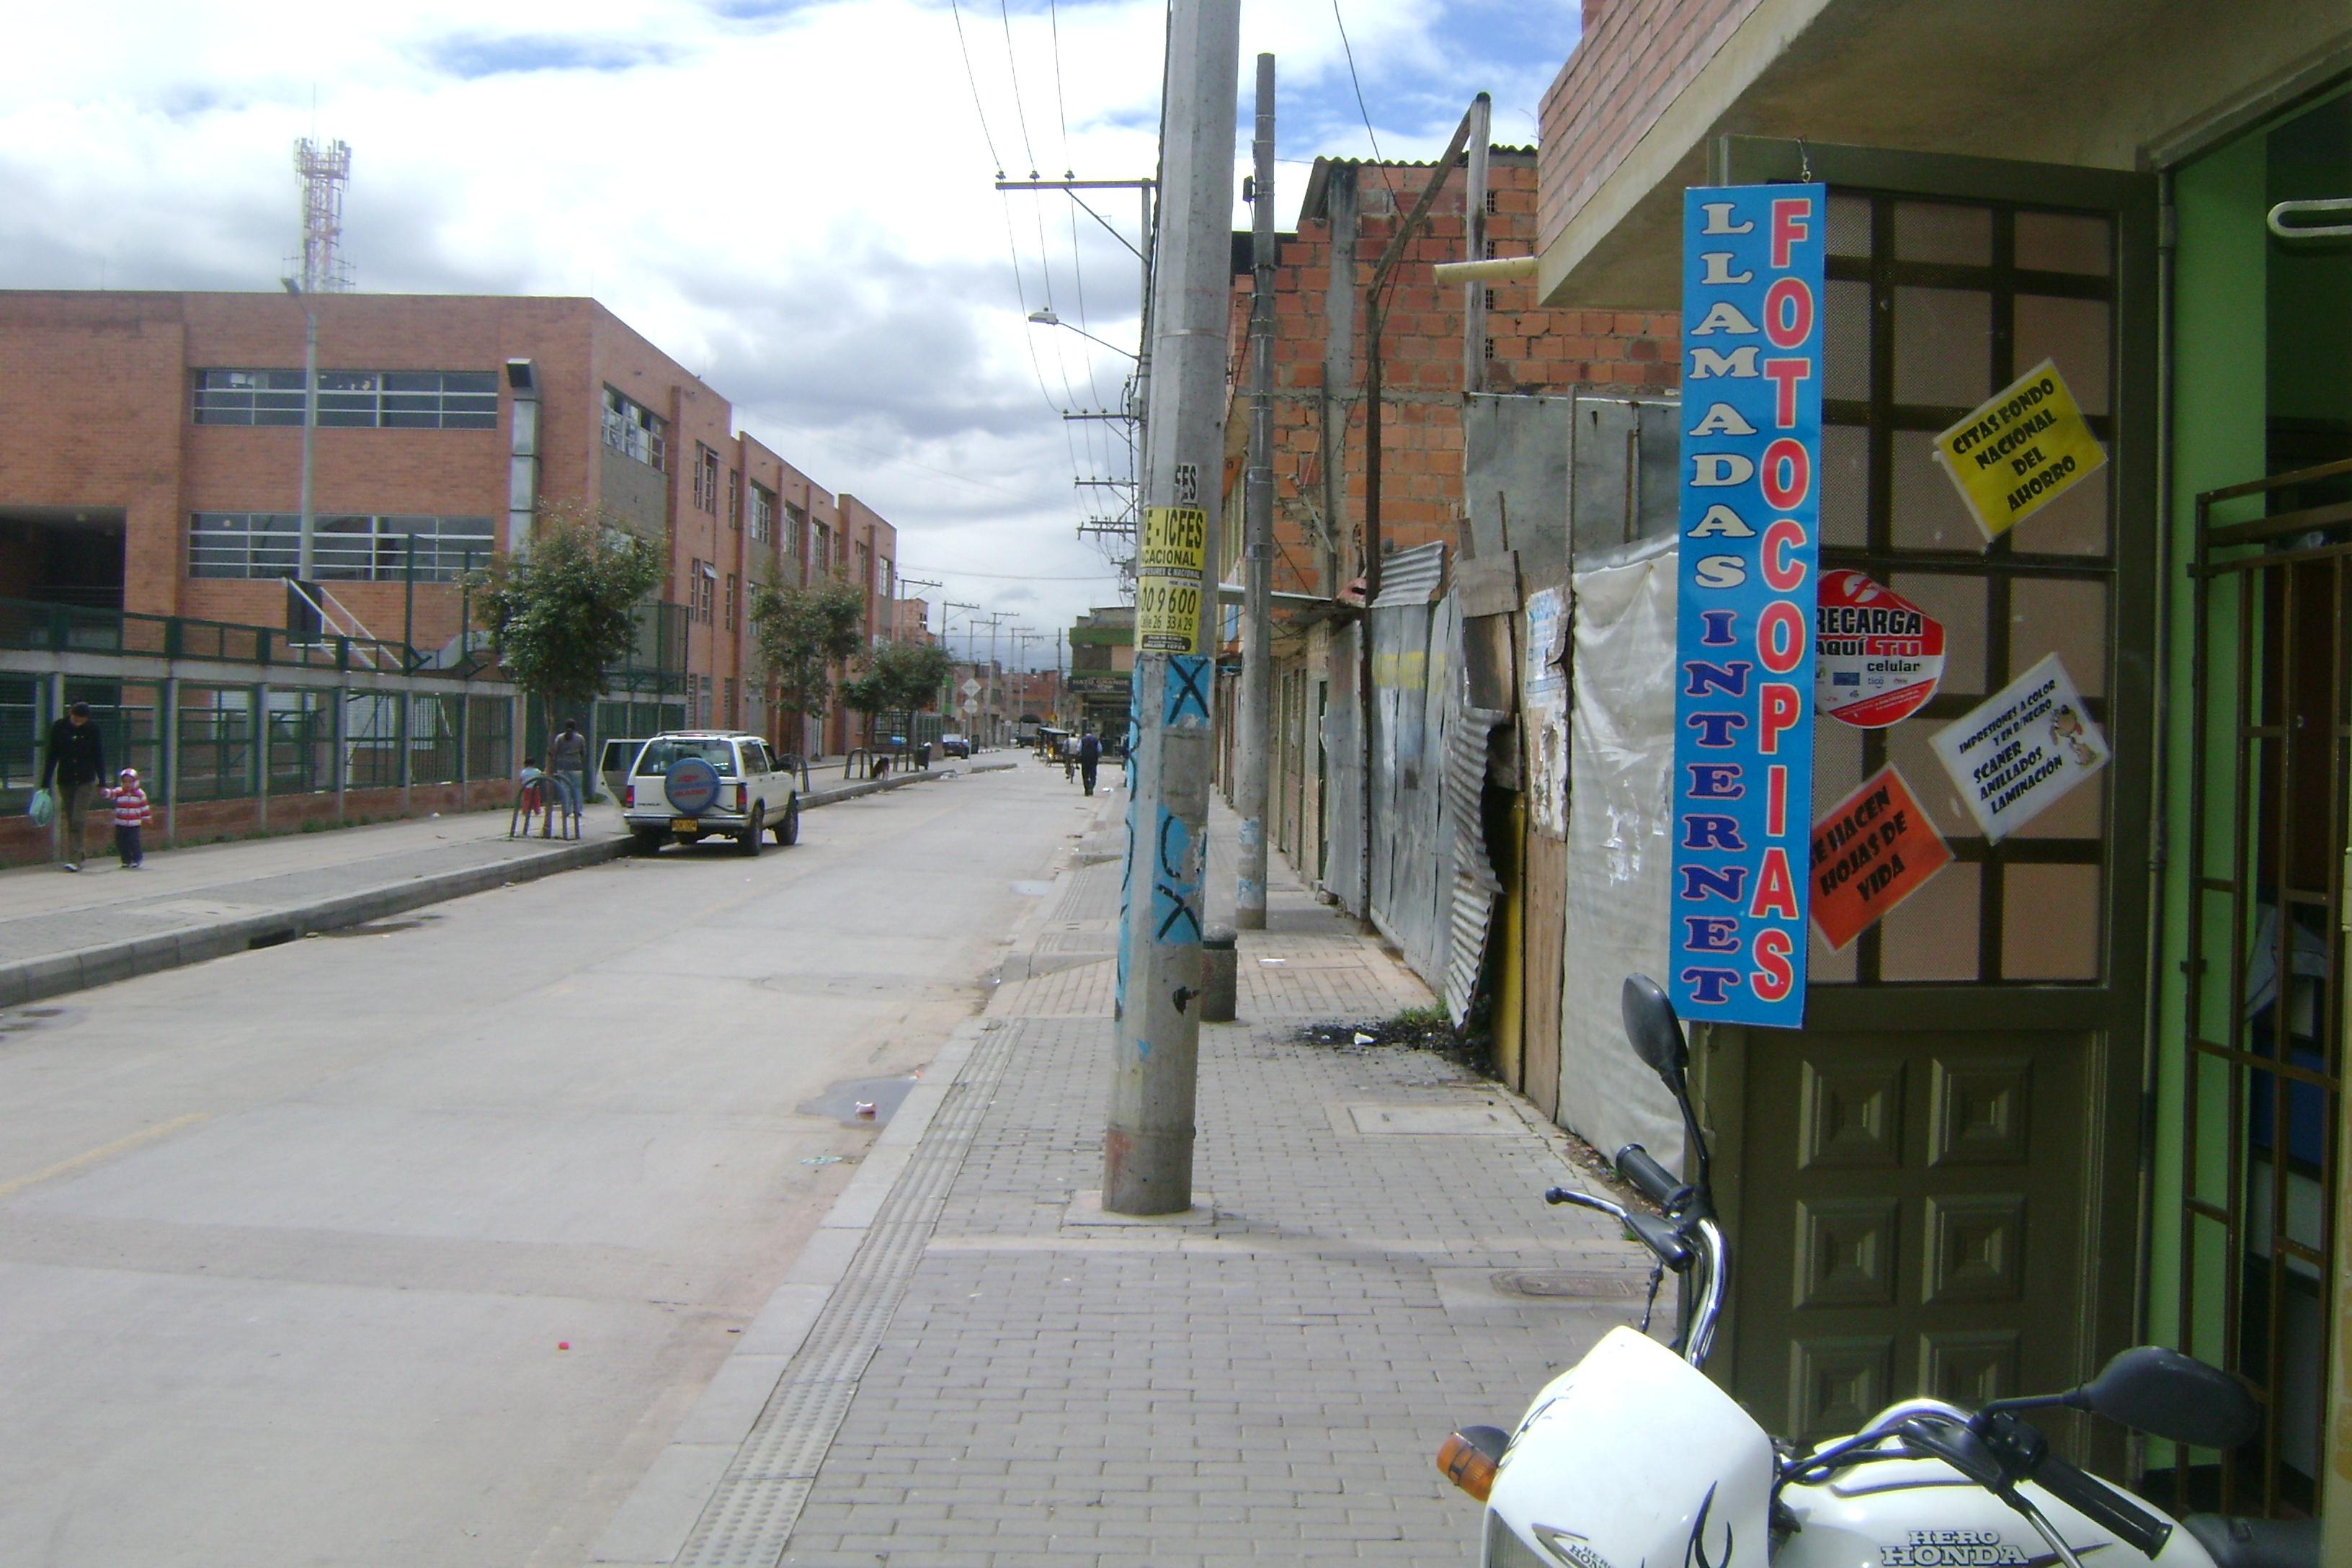 Barrio dindalito patio bonito al dia nuestro informativo for Patio bonito